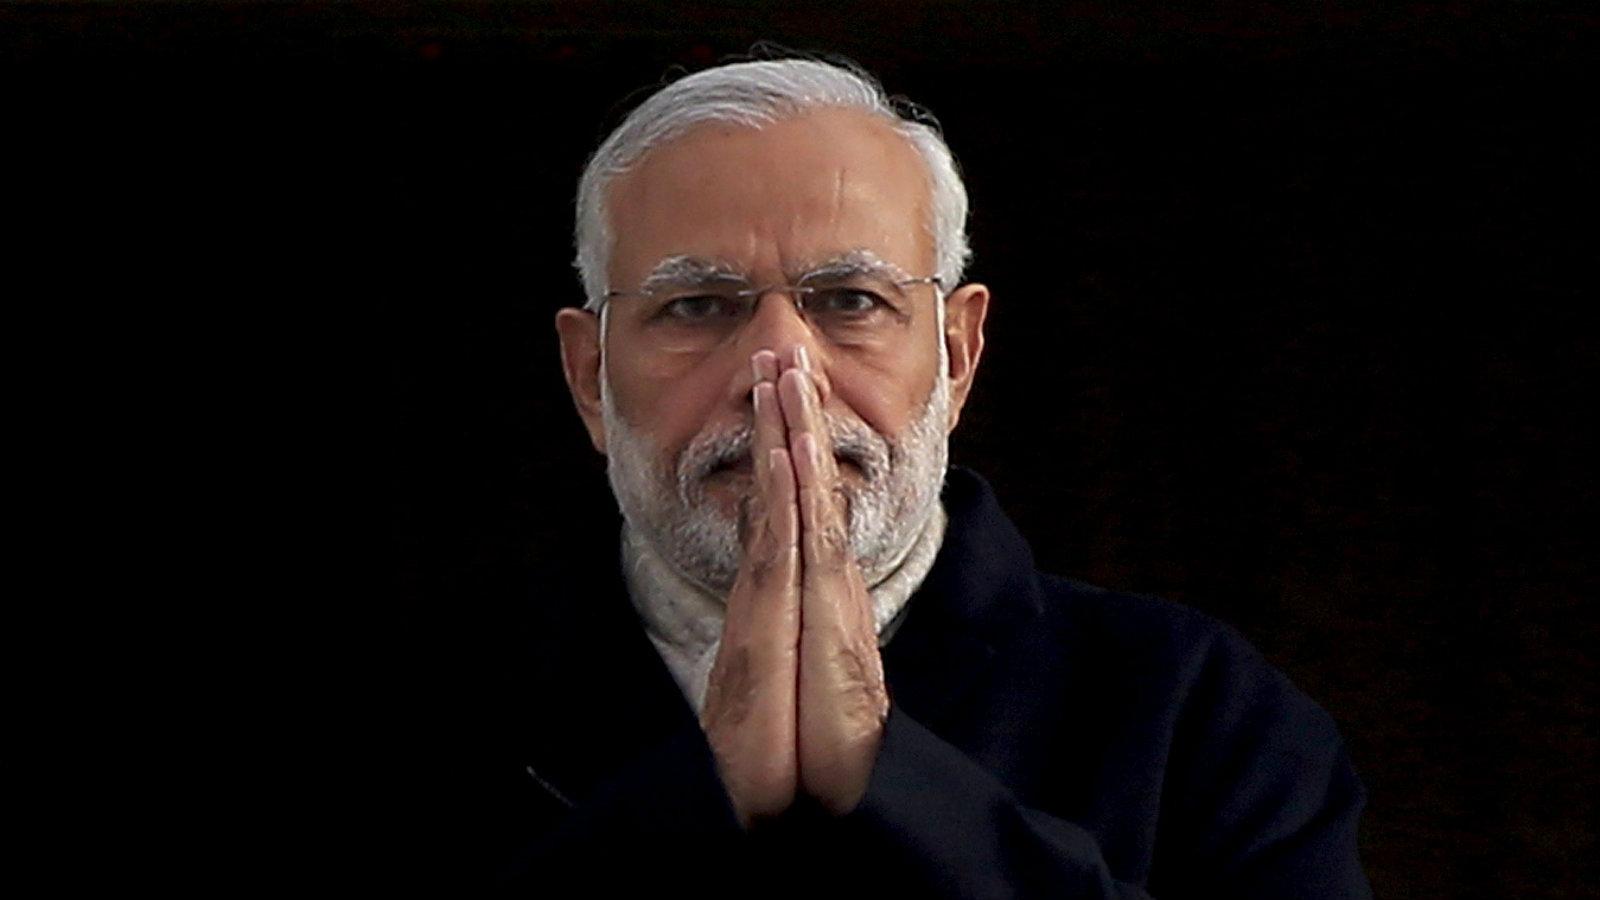 What Modi? Where Modi? How much Modi?—Quora just can't get enough of